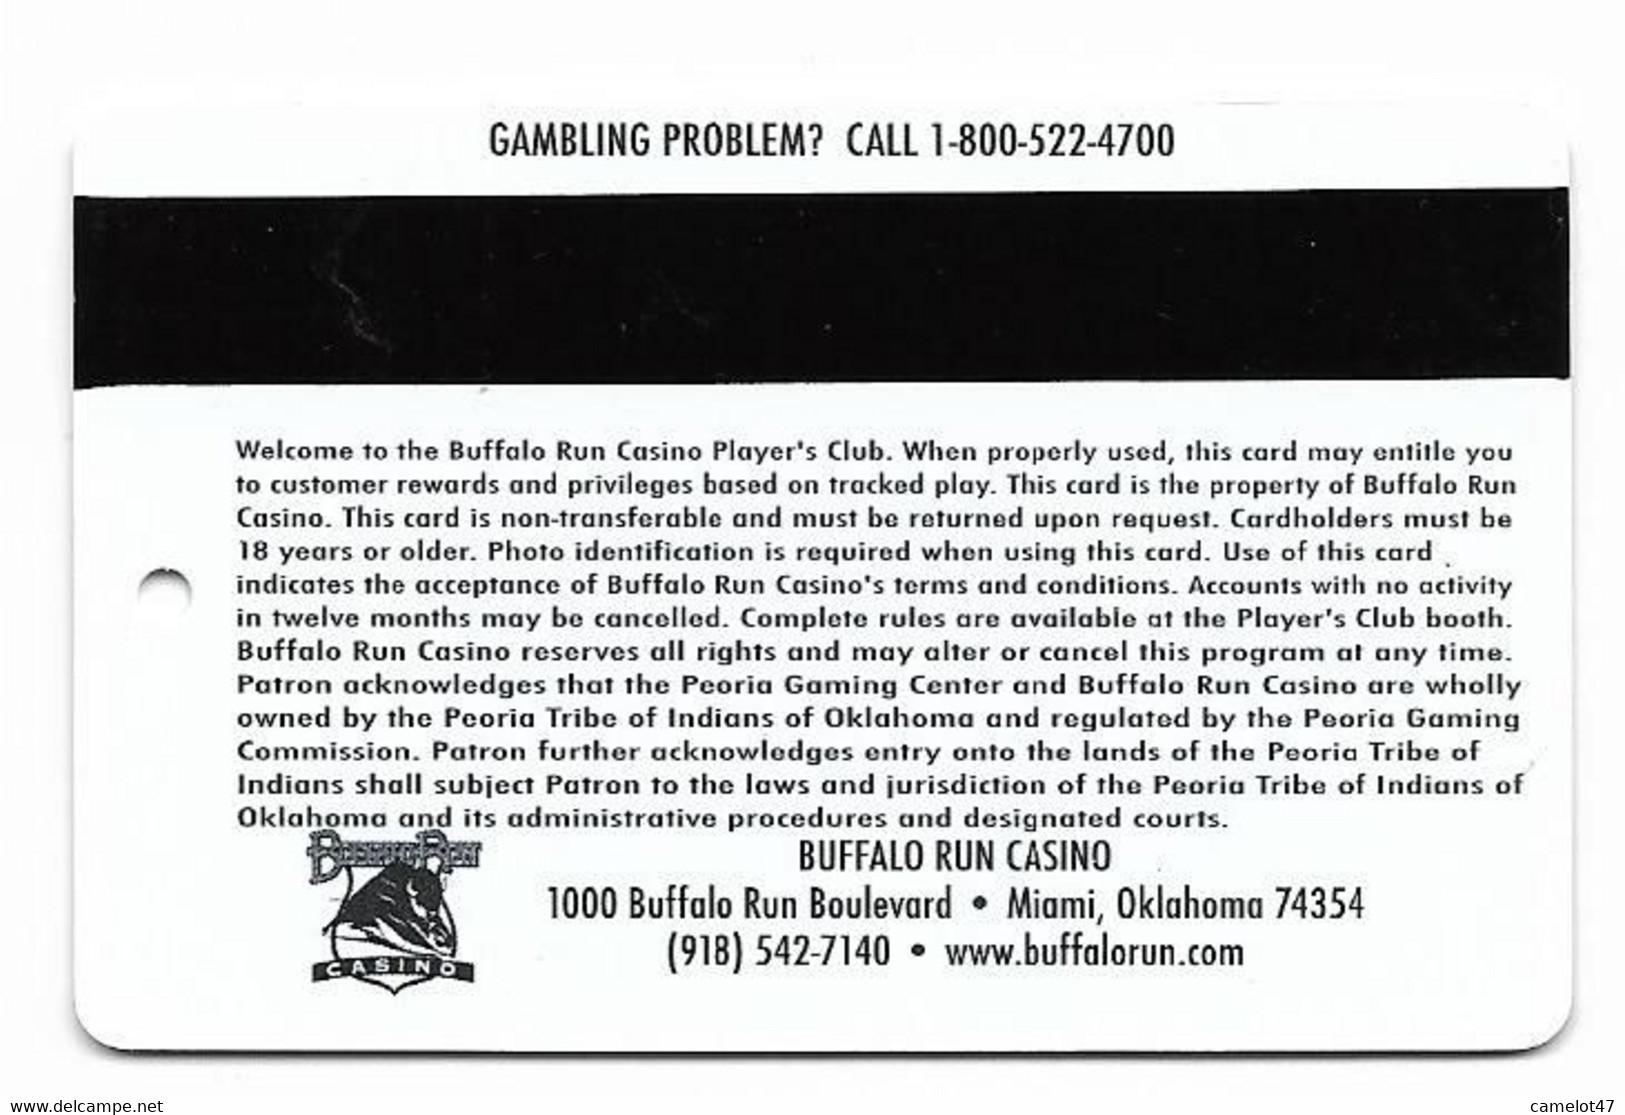 Buffalo Run Casino, Miami, OK, U.S.A., Older Used Slot Or Player's Card, # Buffalorun-2 - Casino Cards